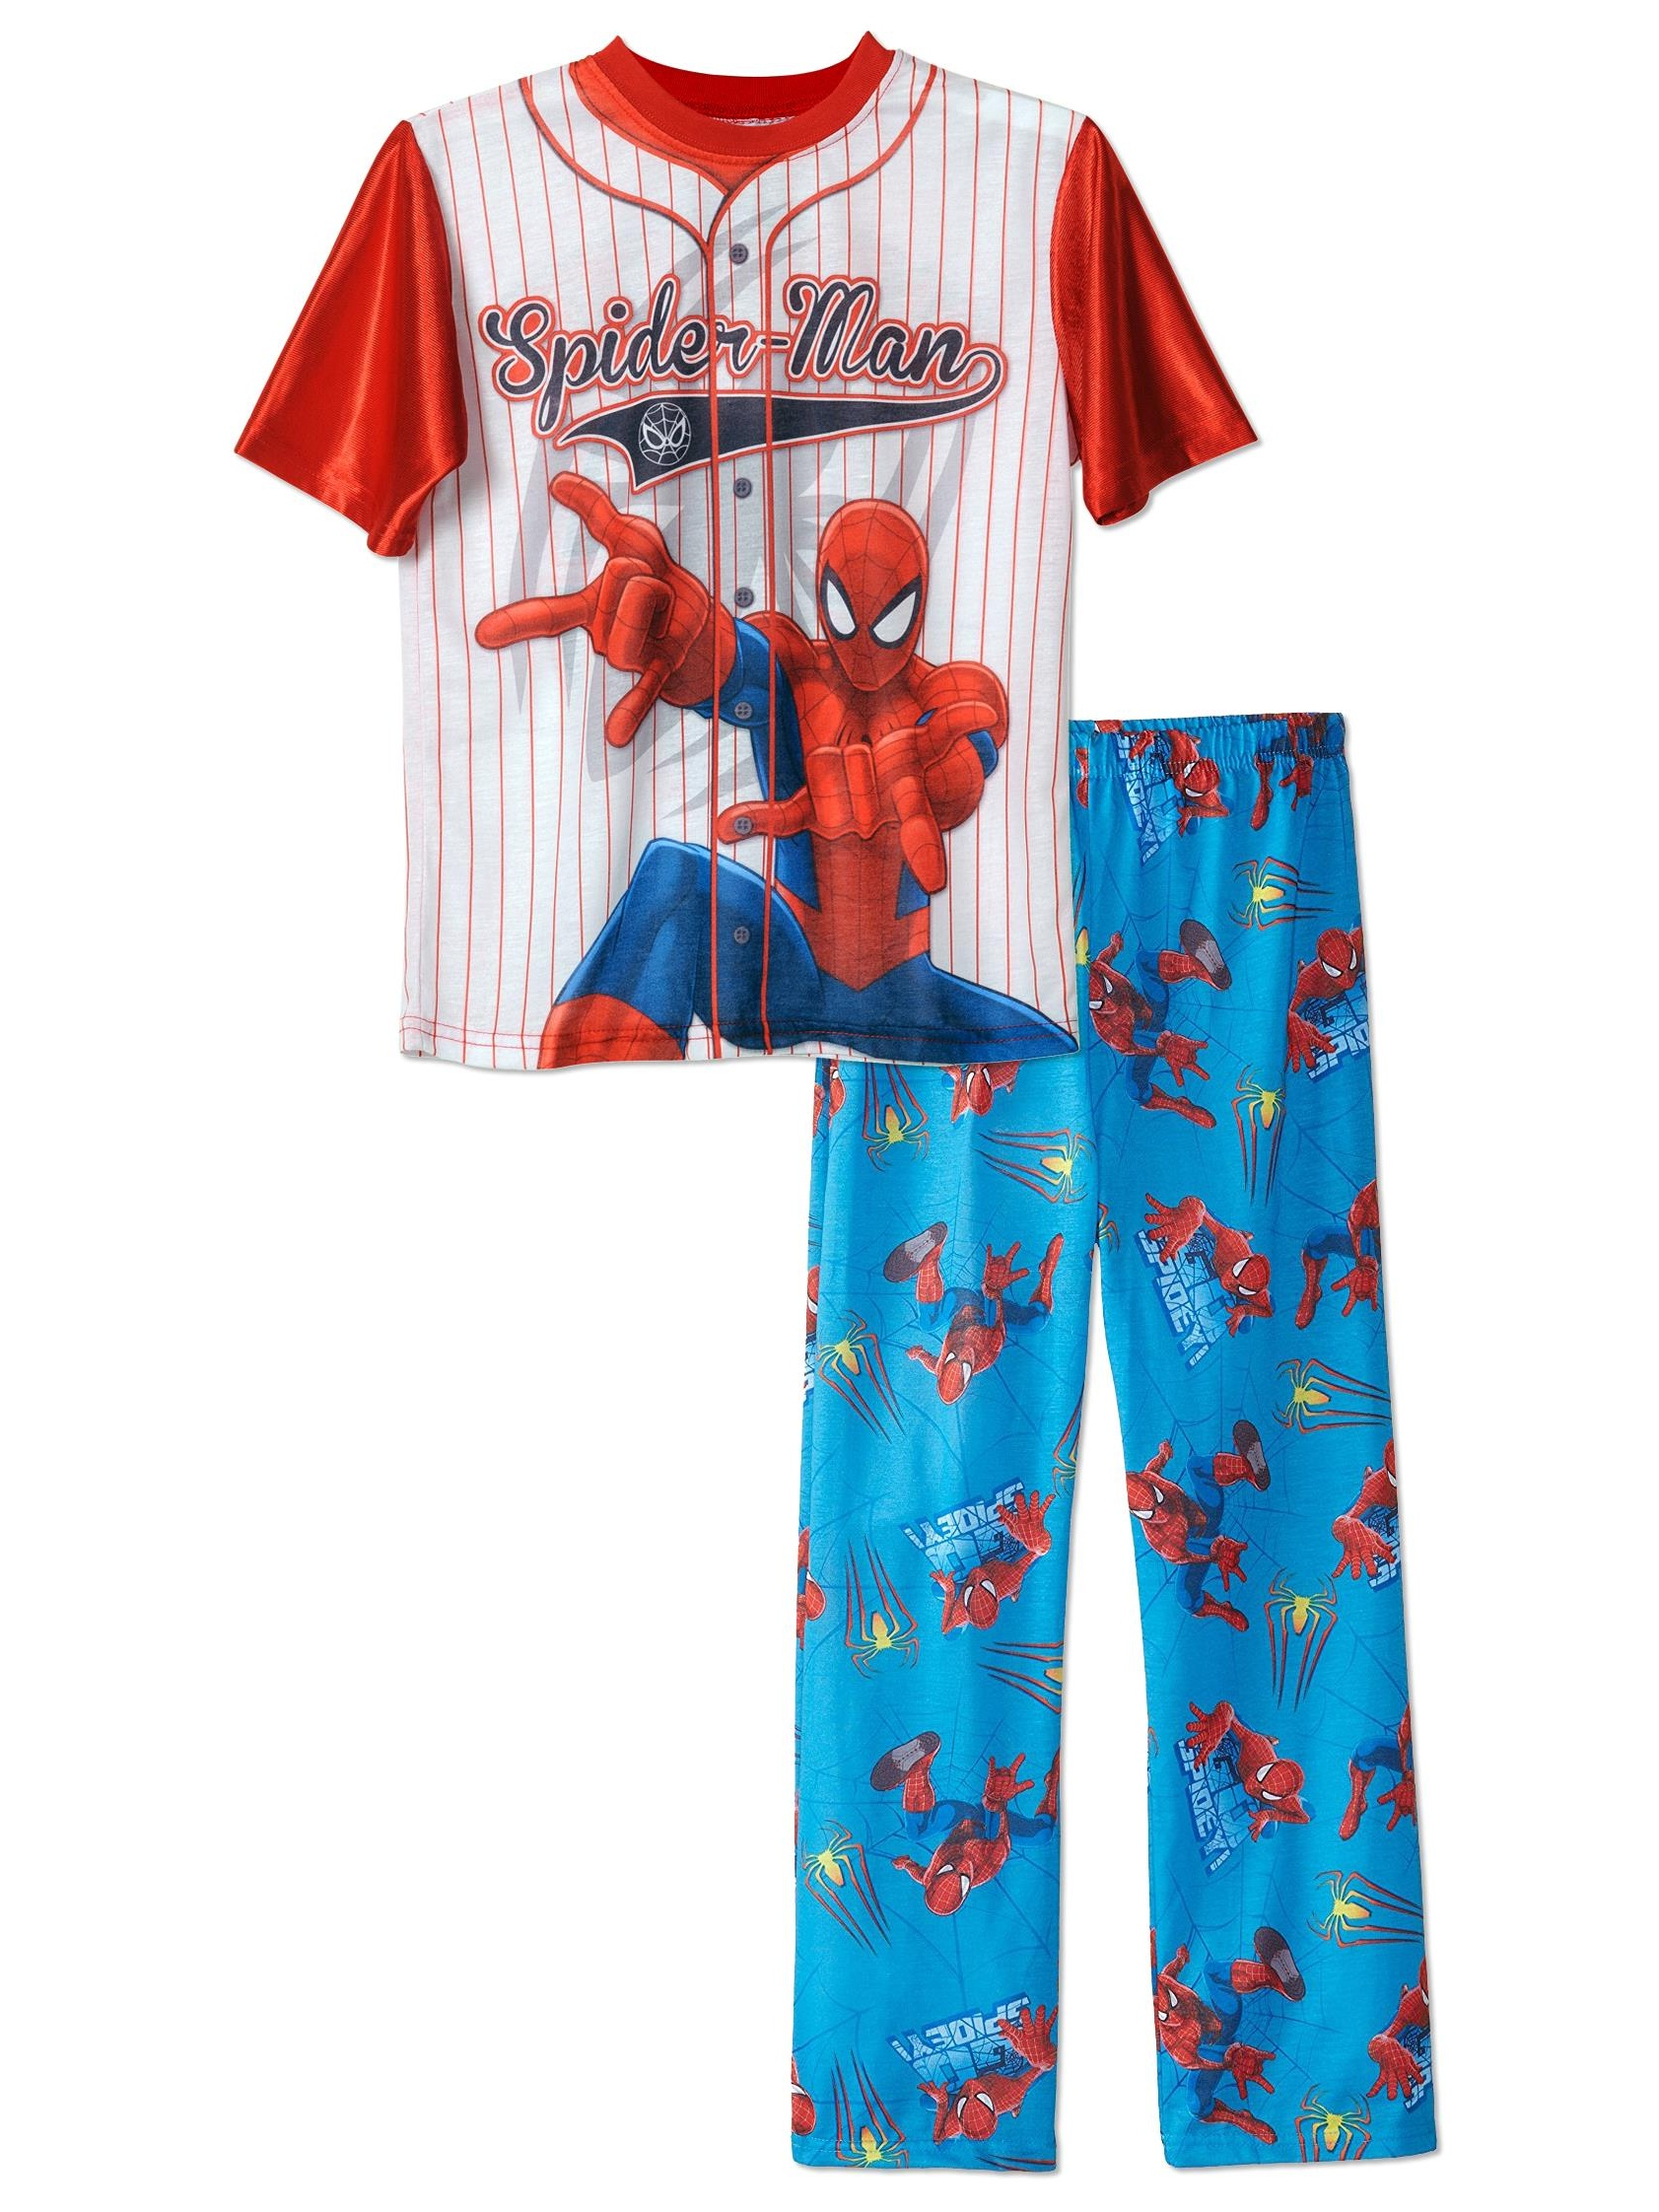 Boys Spiderman Baseball Jersey 2-piece Pajama Sleepwear Set , Kids Sizes 4-12, White, Size: 4-5